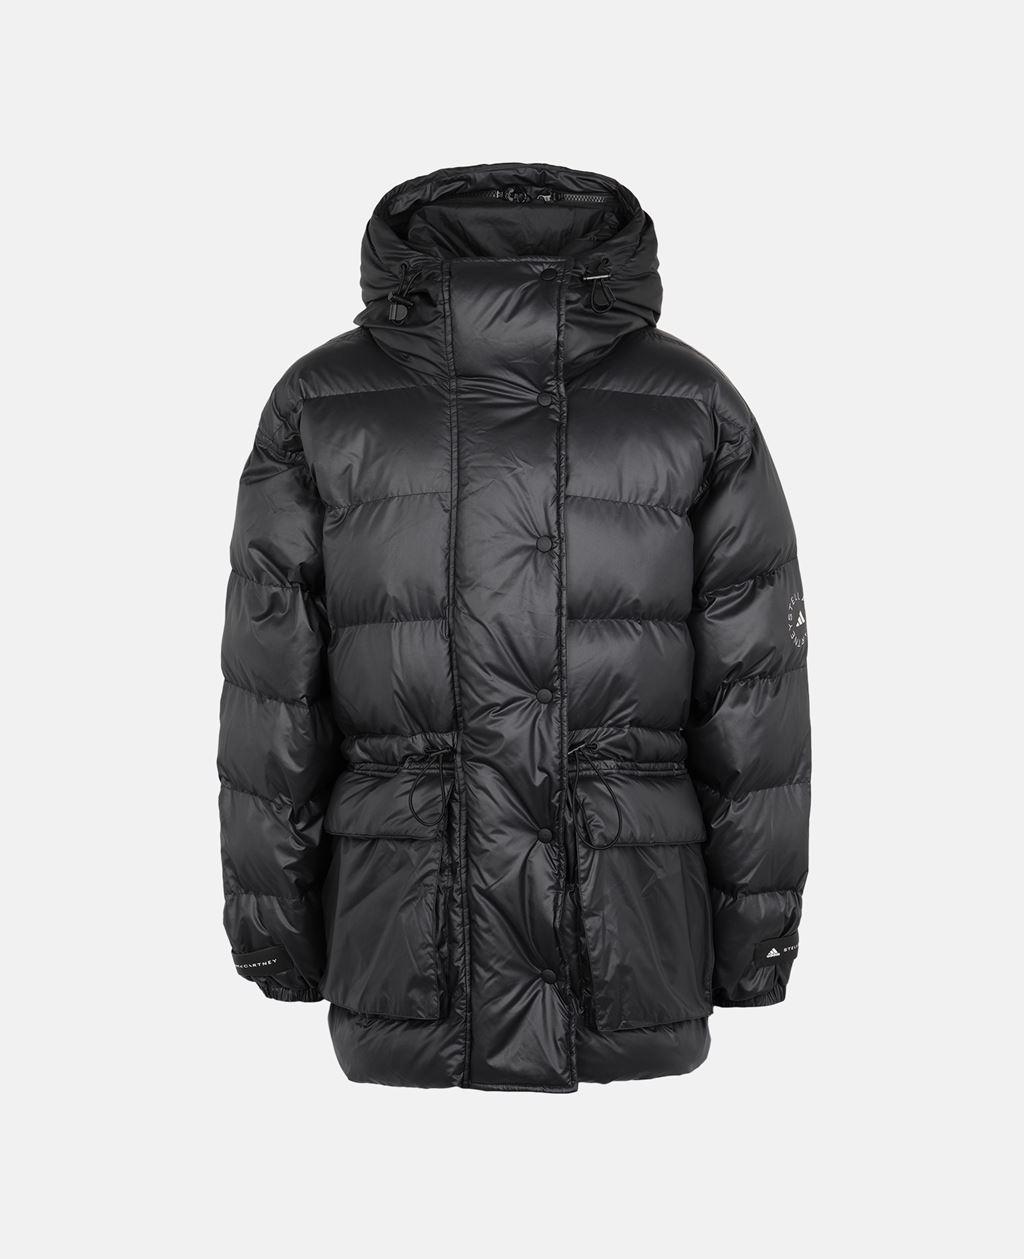 Stella McCartney Black 2-in-1 Mid-Length Padded Jacket